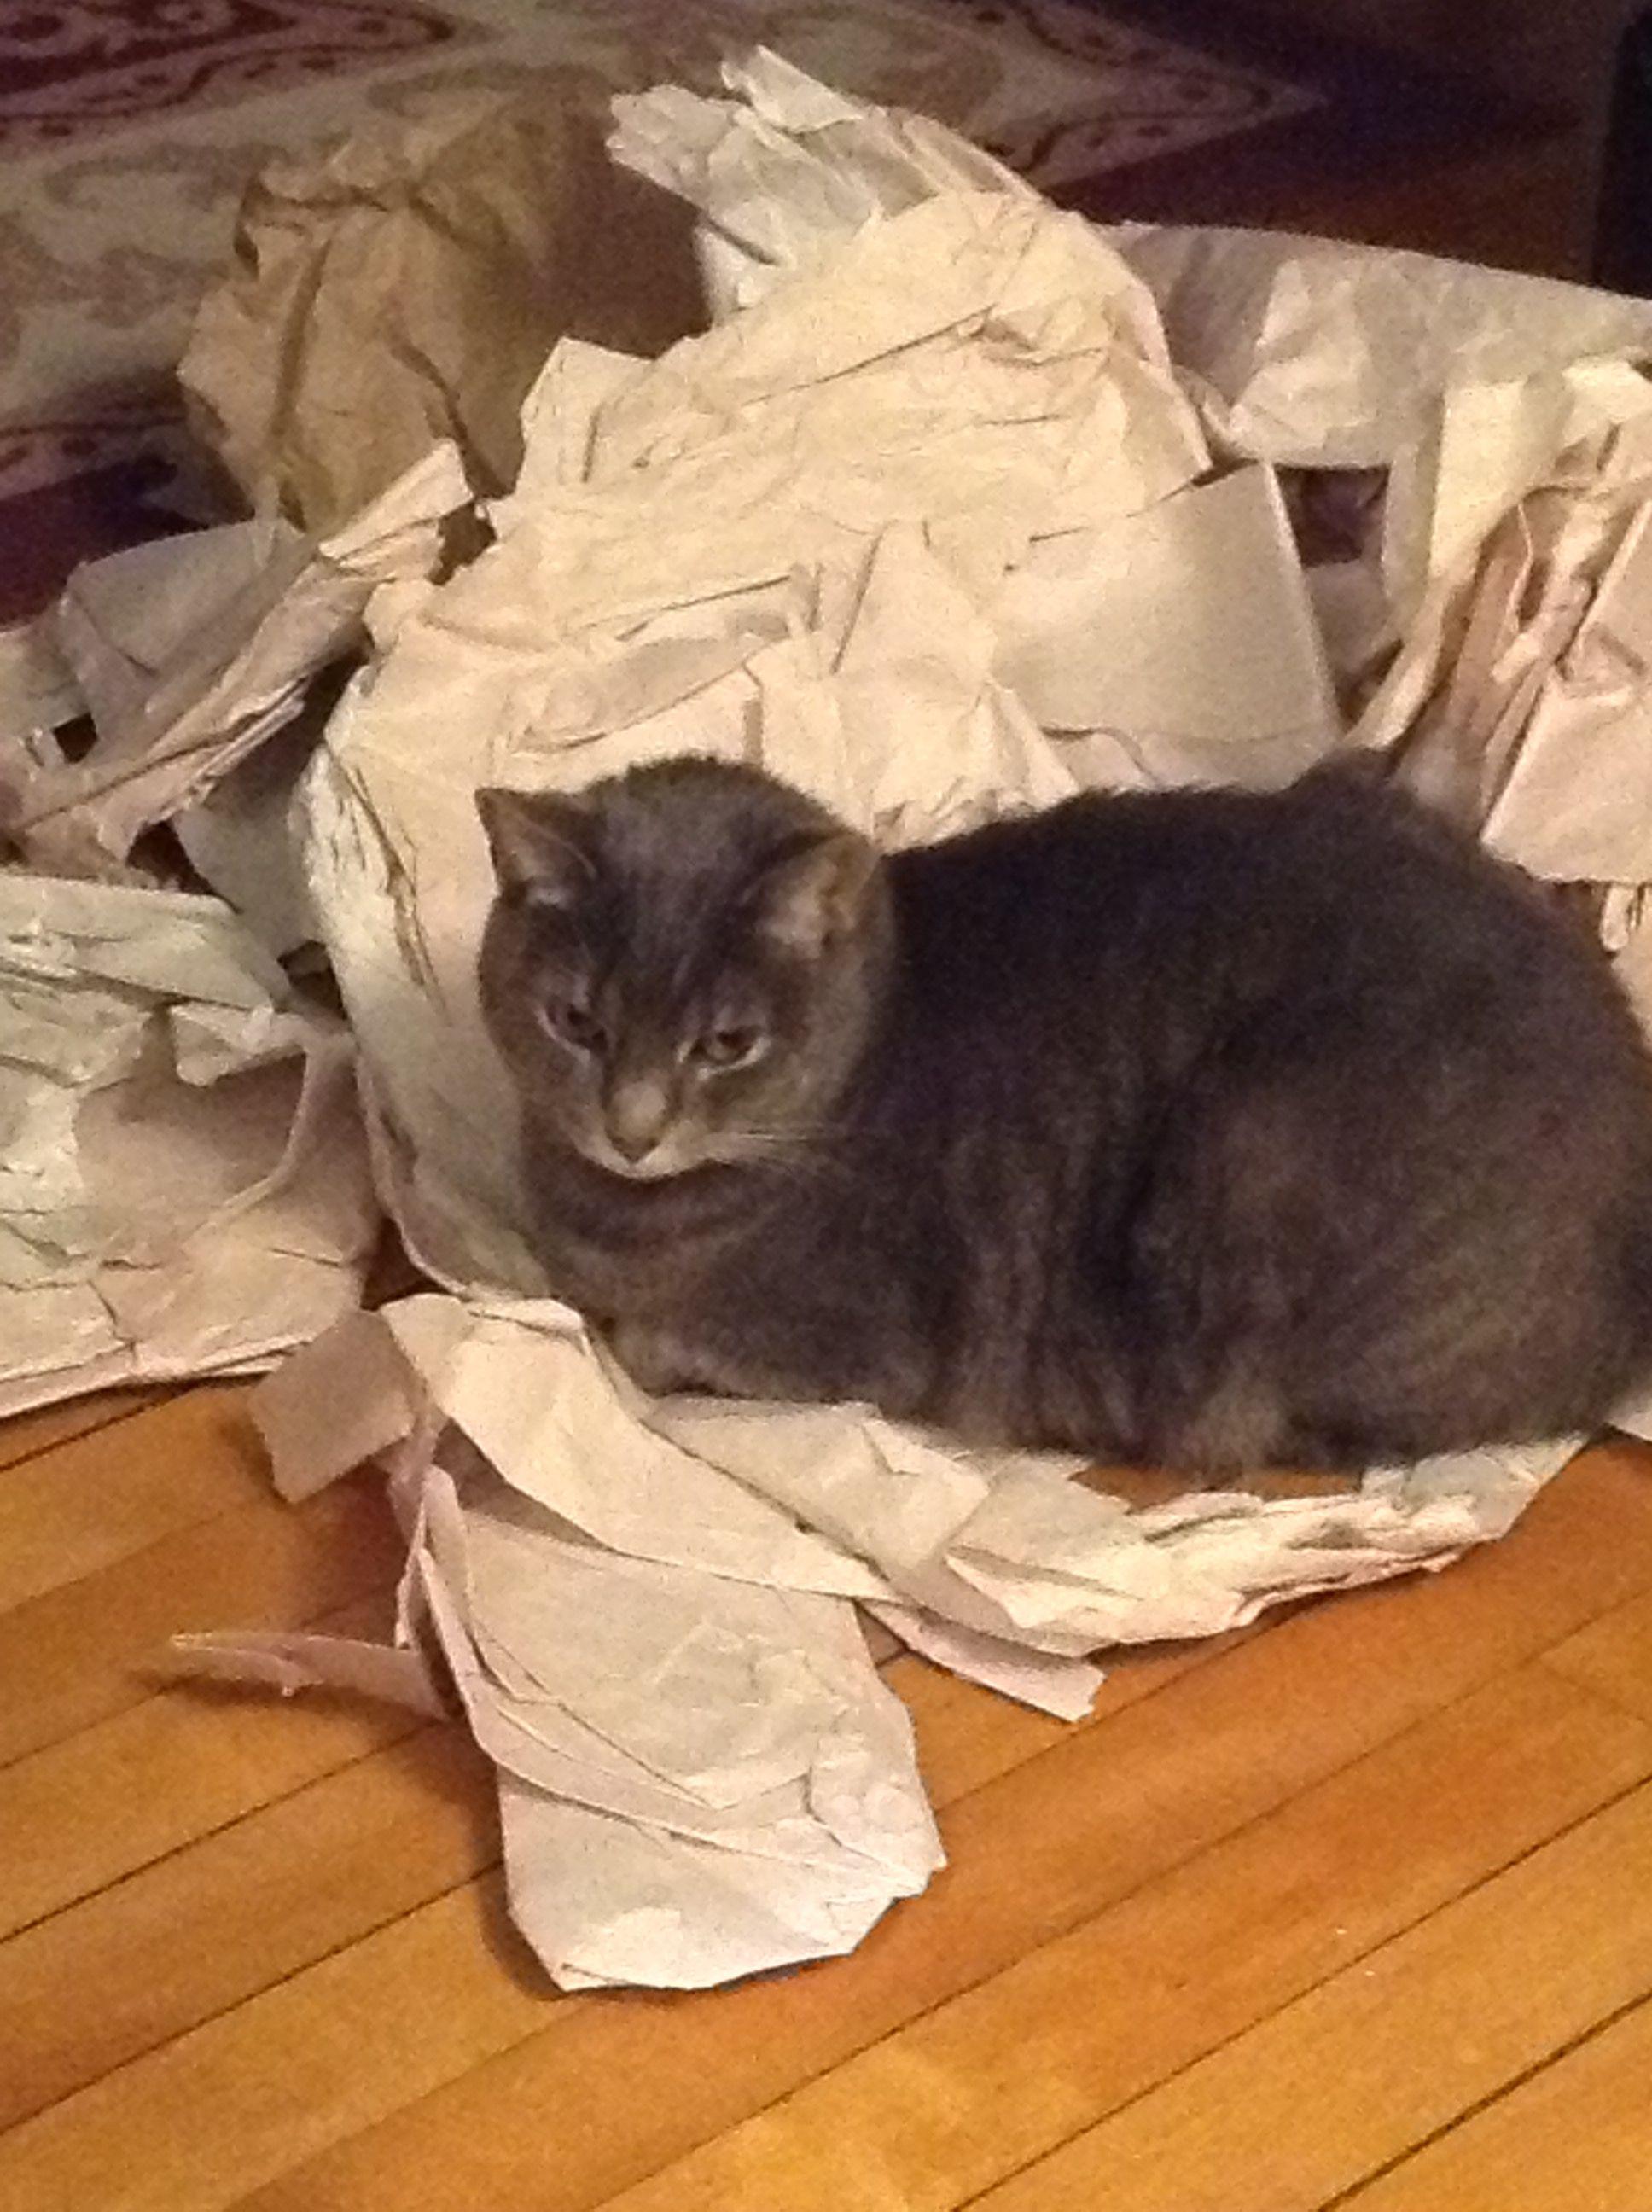 Misty Moo is satisfied that her work is done.   #cat #caturday #MistyMoo #MistyMooofMedfordMA